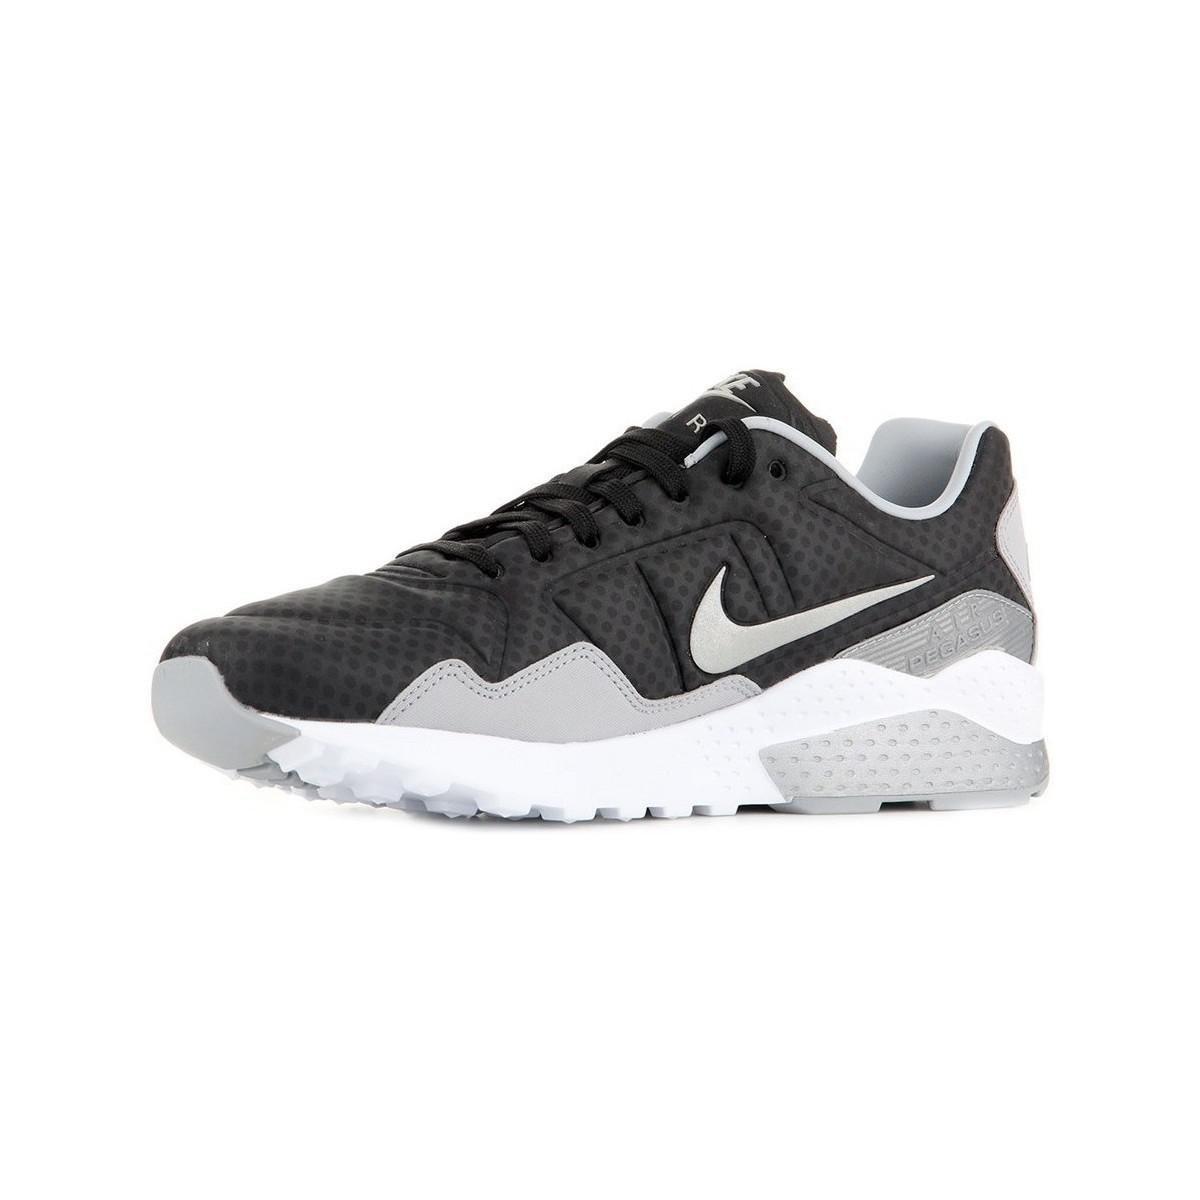 online store 508e9 dea7b ... promo code nike. air zoom pegasus 92 prm womens shoes trainers in black  40d9b a6a7e ...